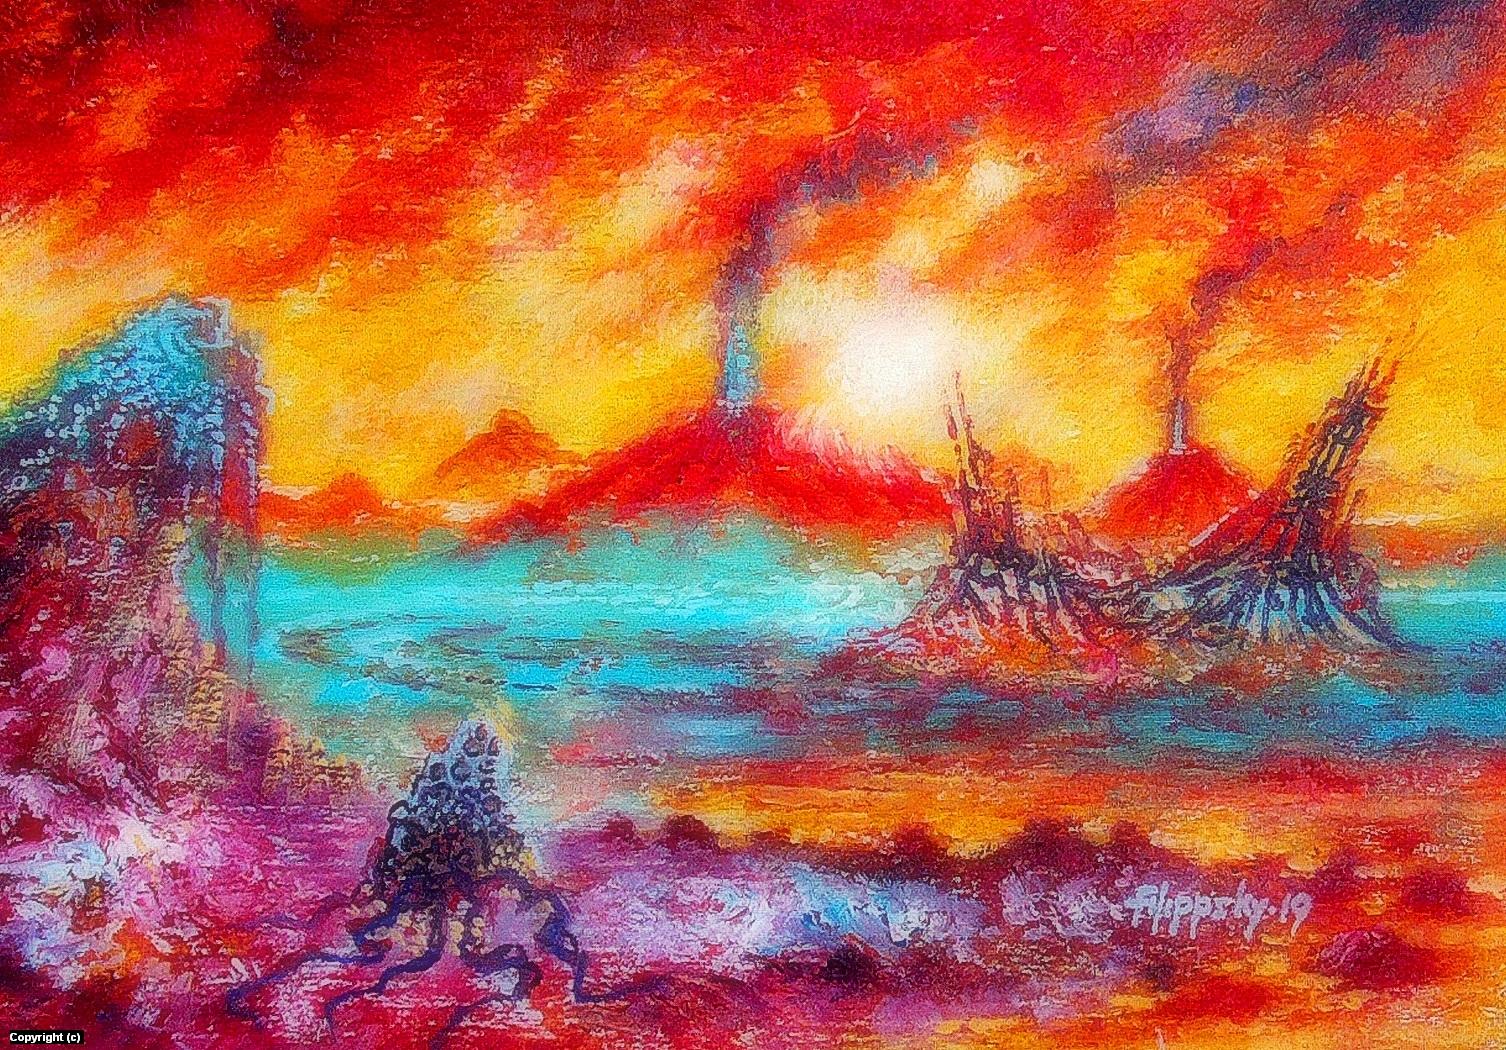 Sol 584. Artwork by Victor Filippsky